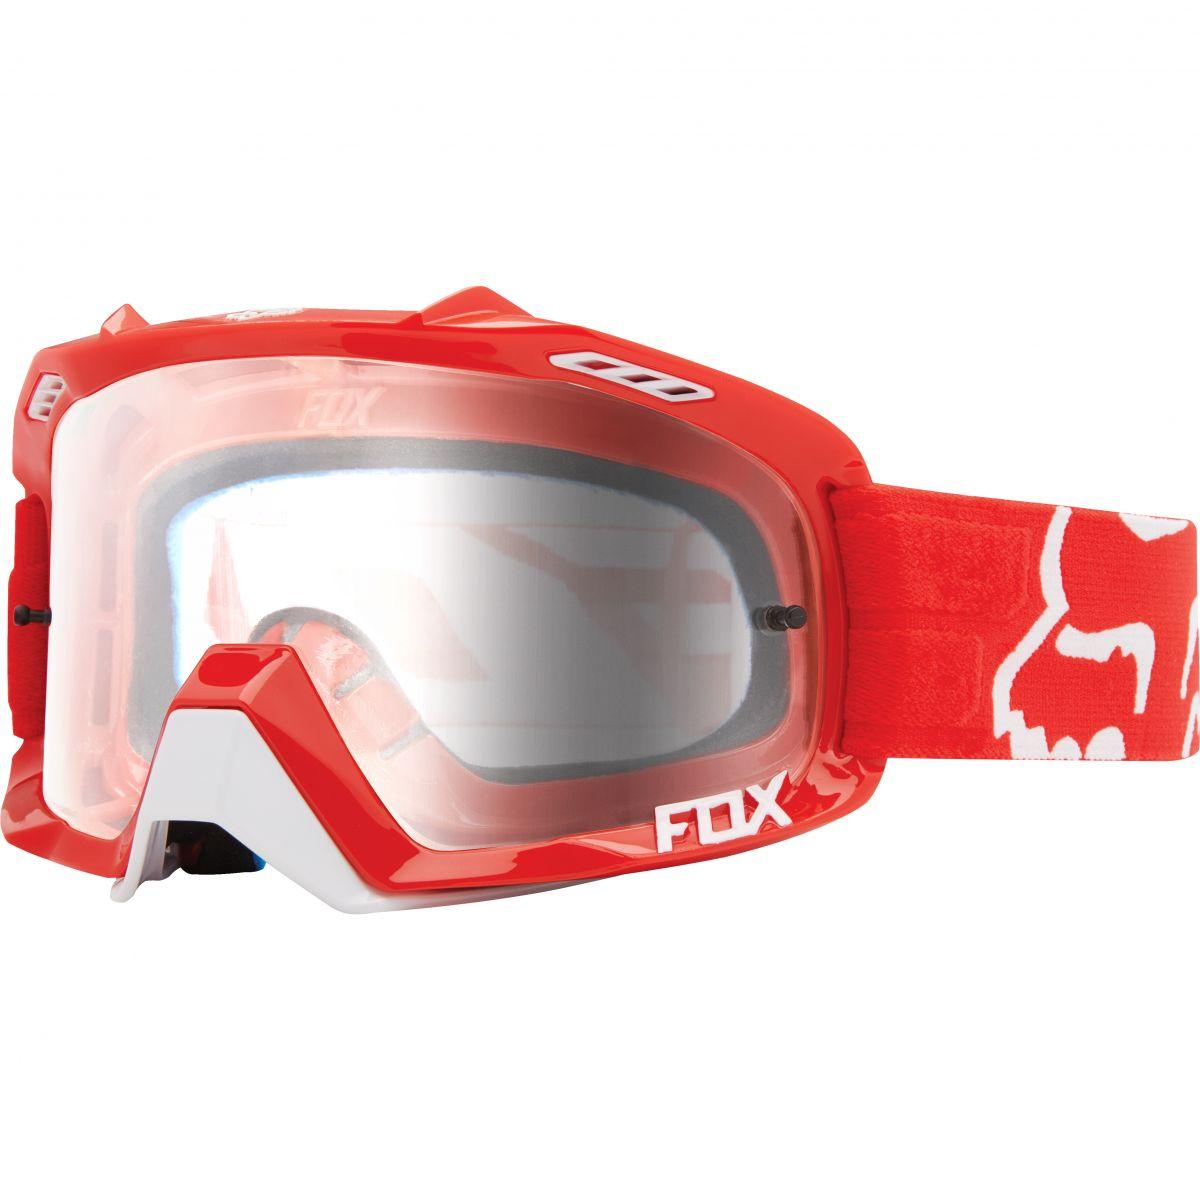 Fox - 2018 Air Defence Race Red очки, красные